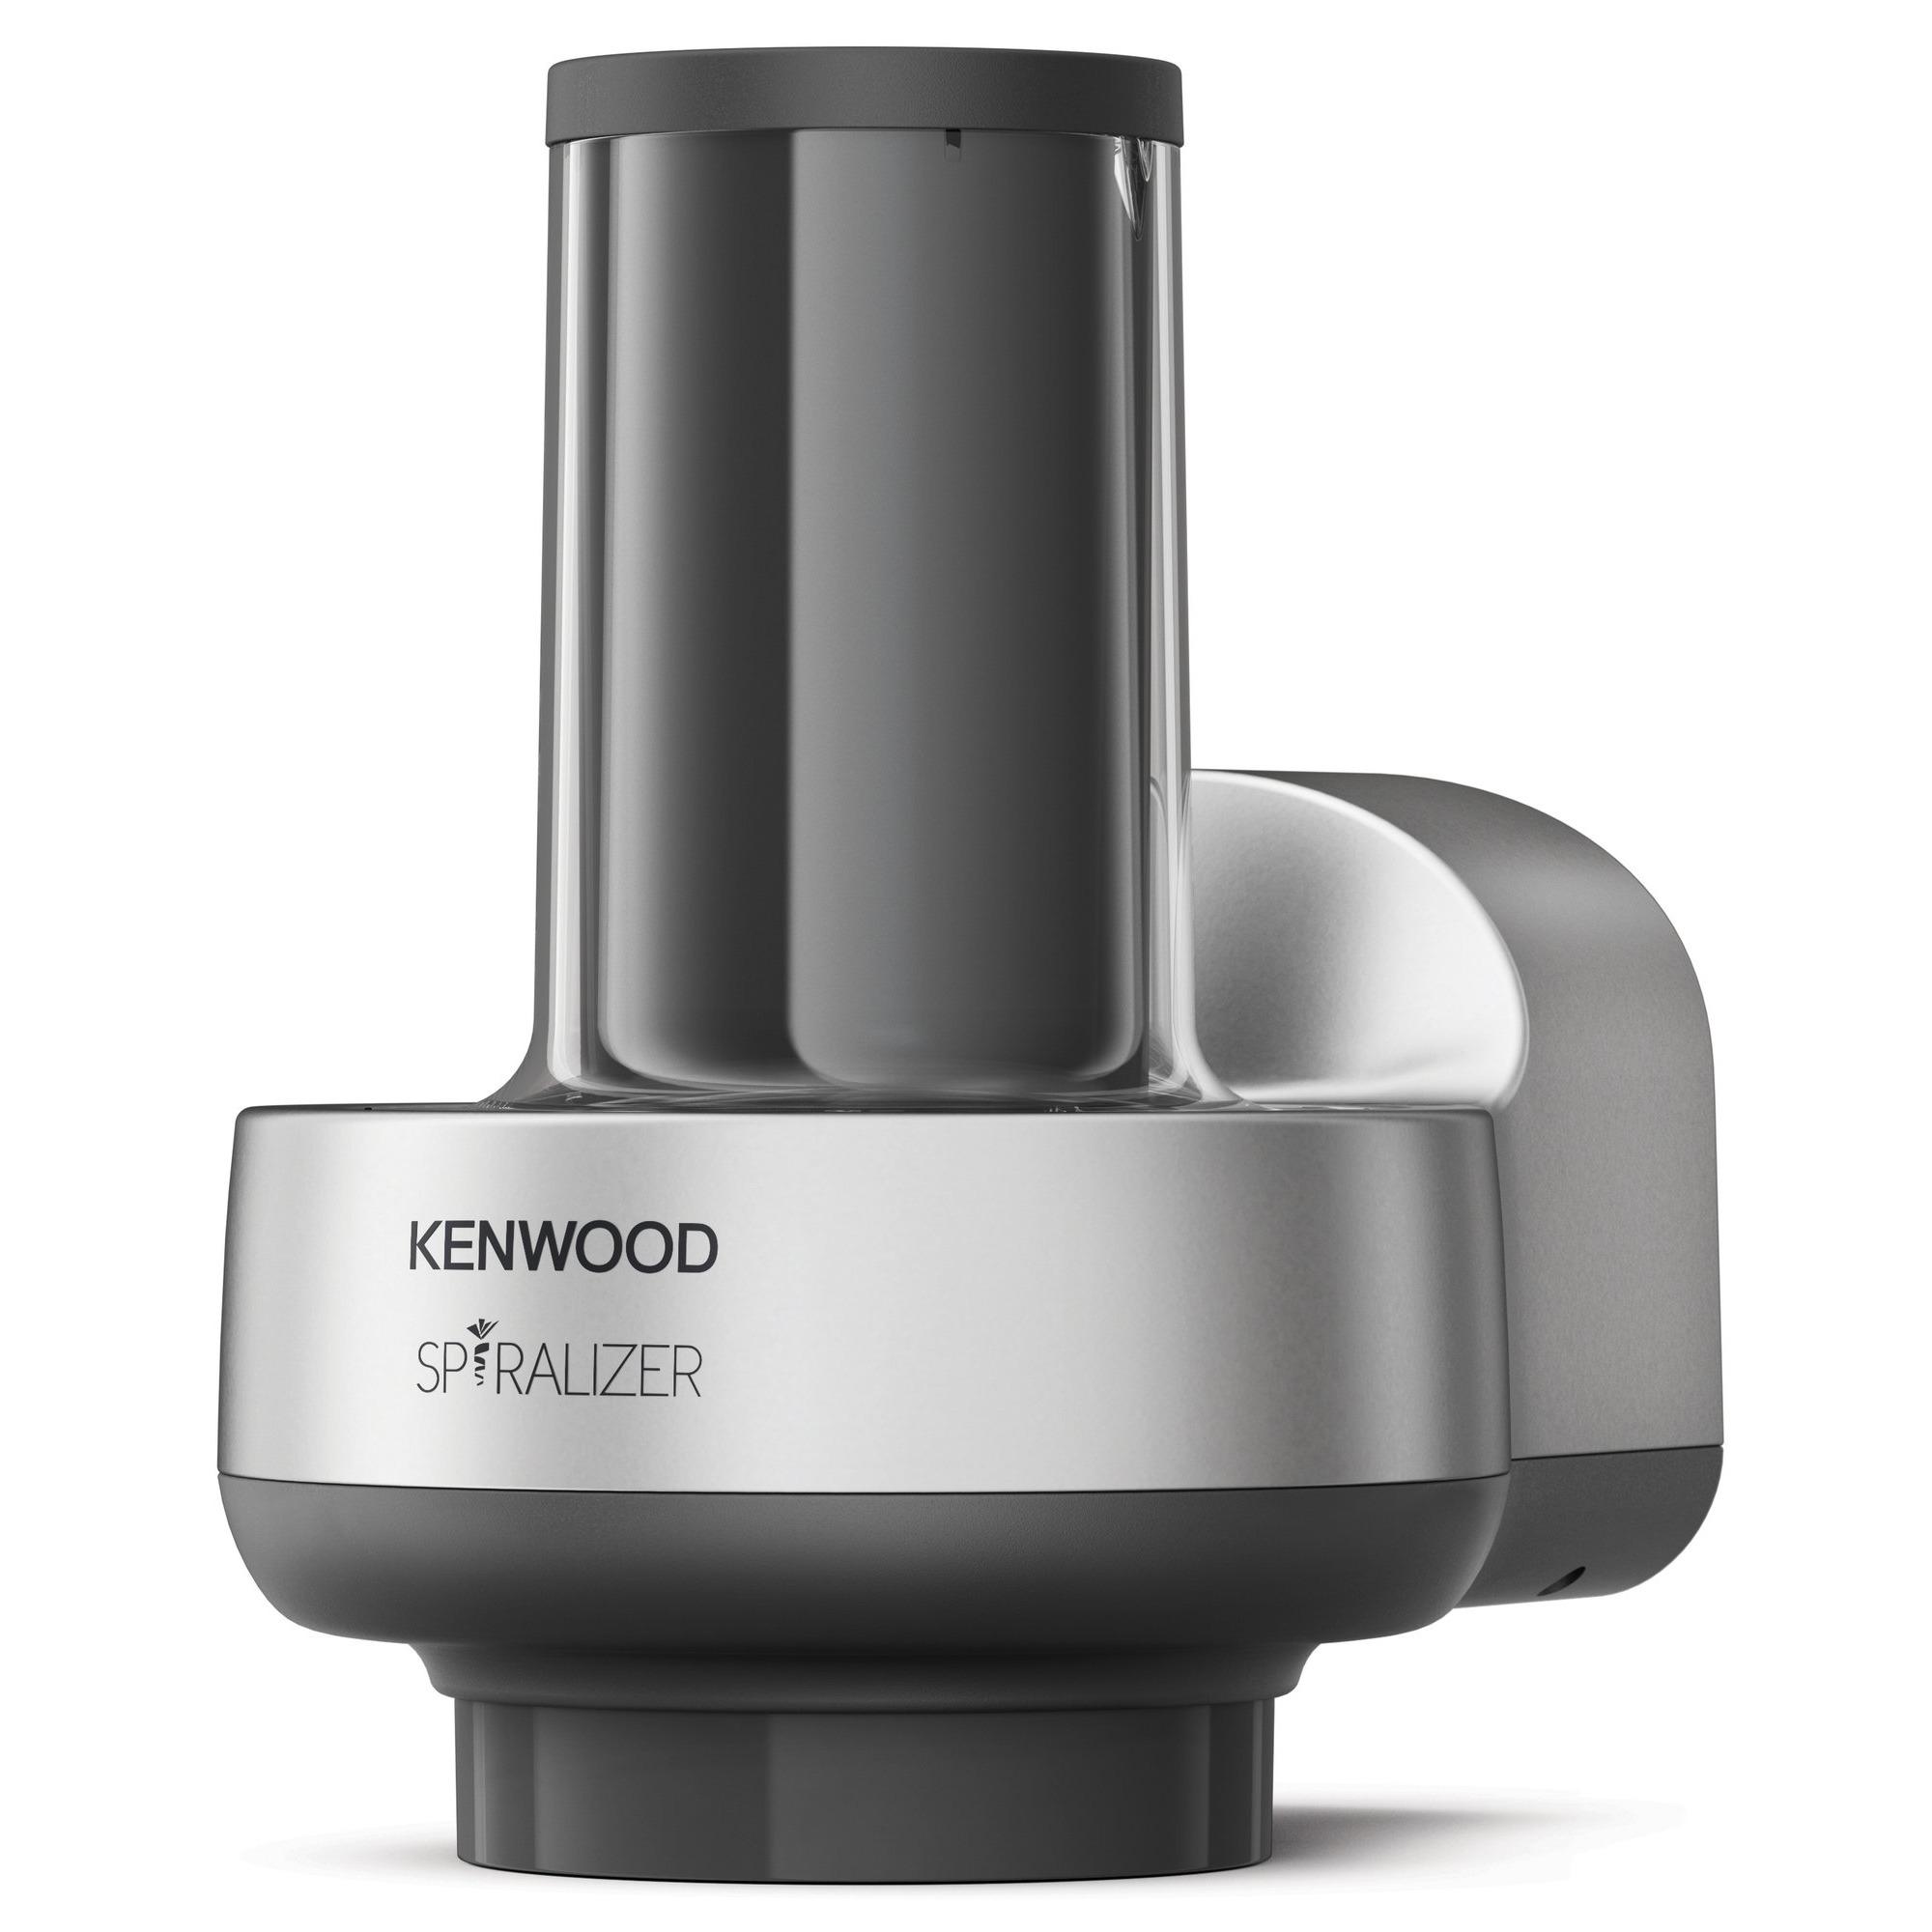 Kenwood KAX700PL spiralskärare (grönsakssvarv)